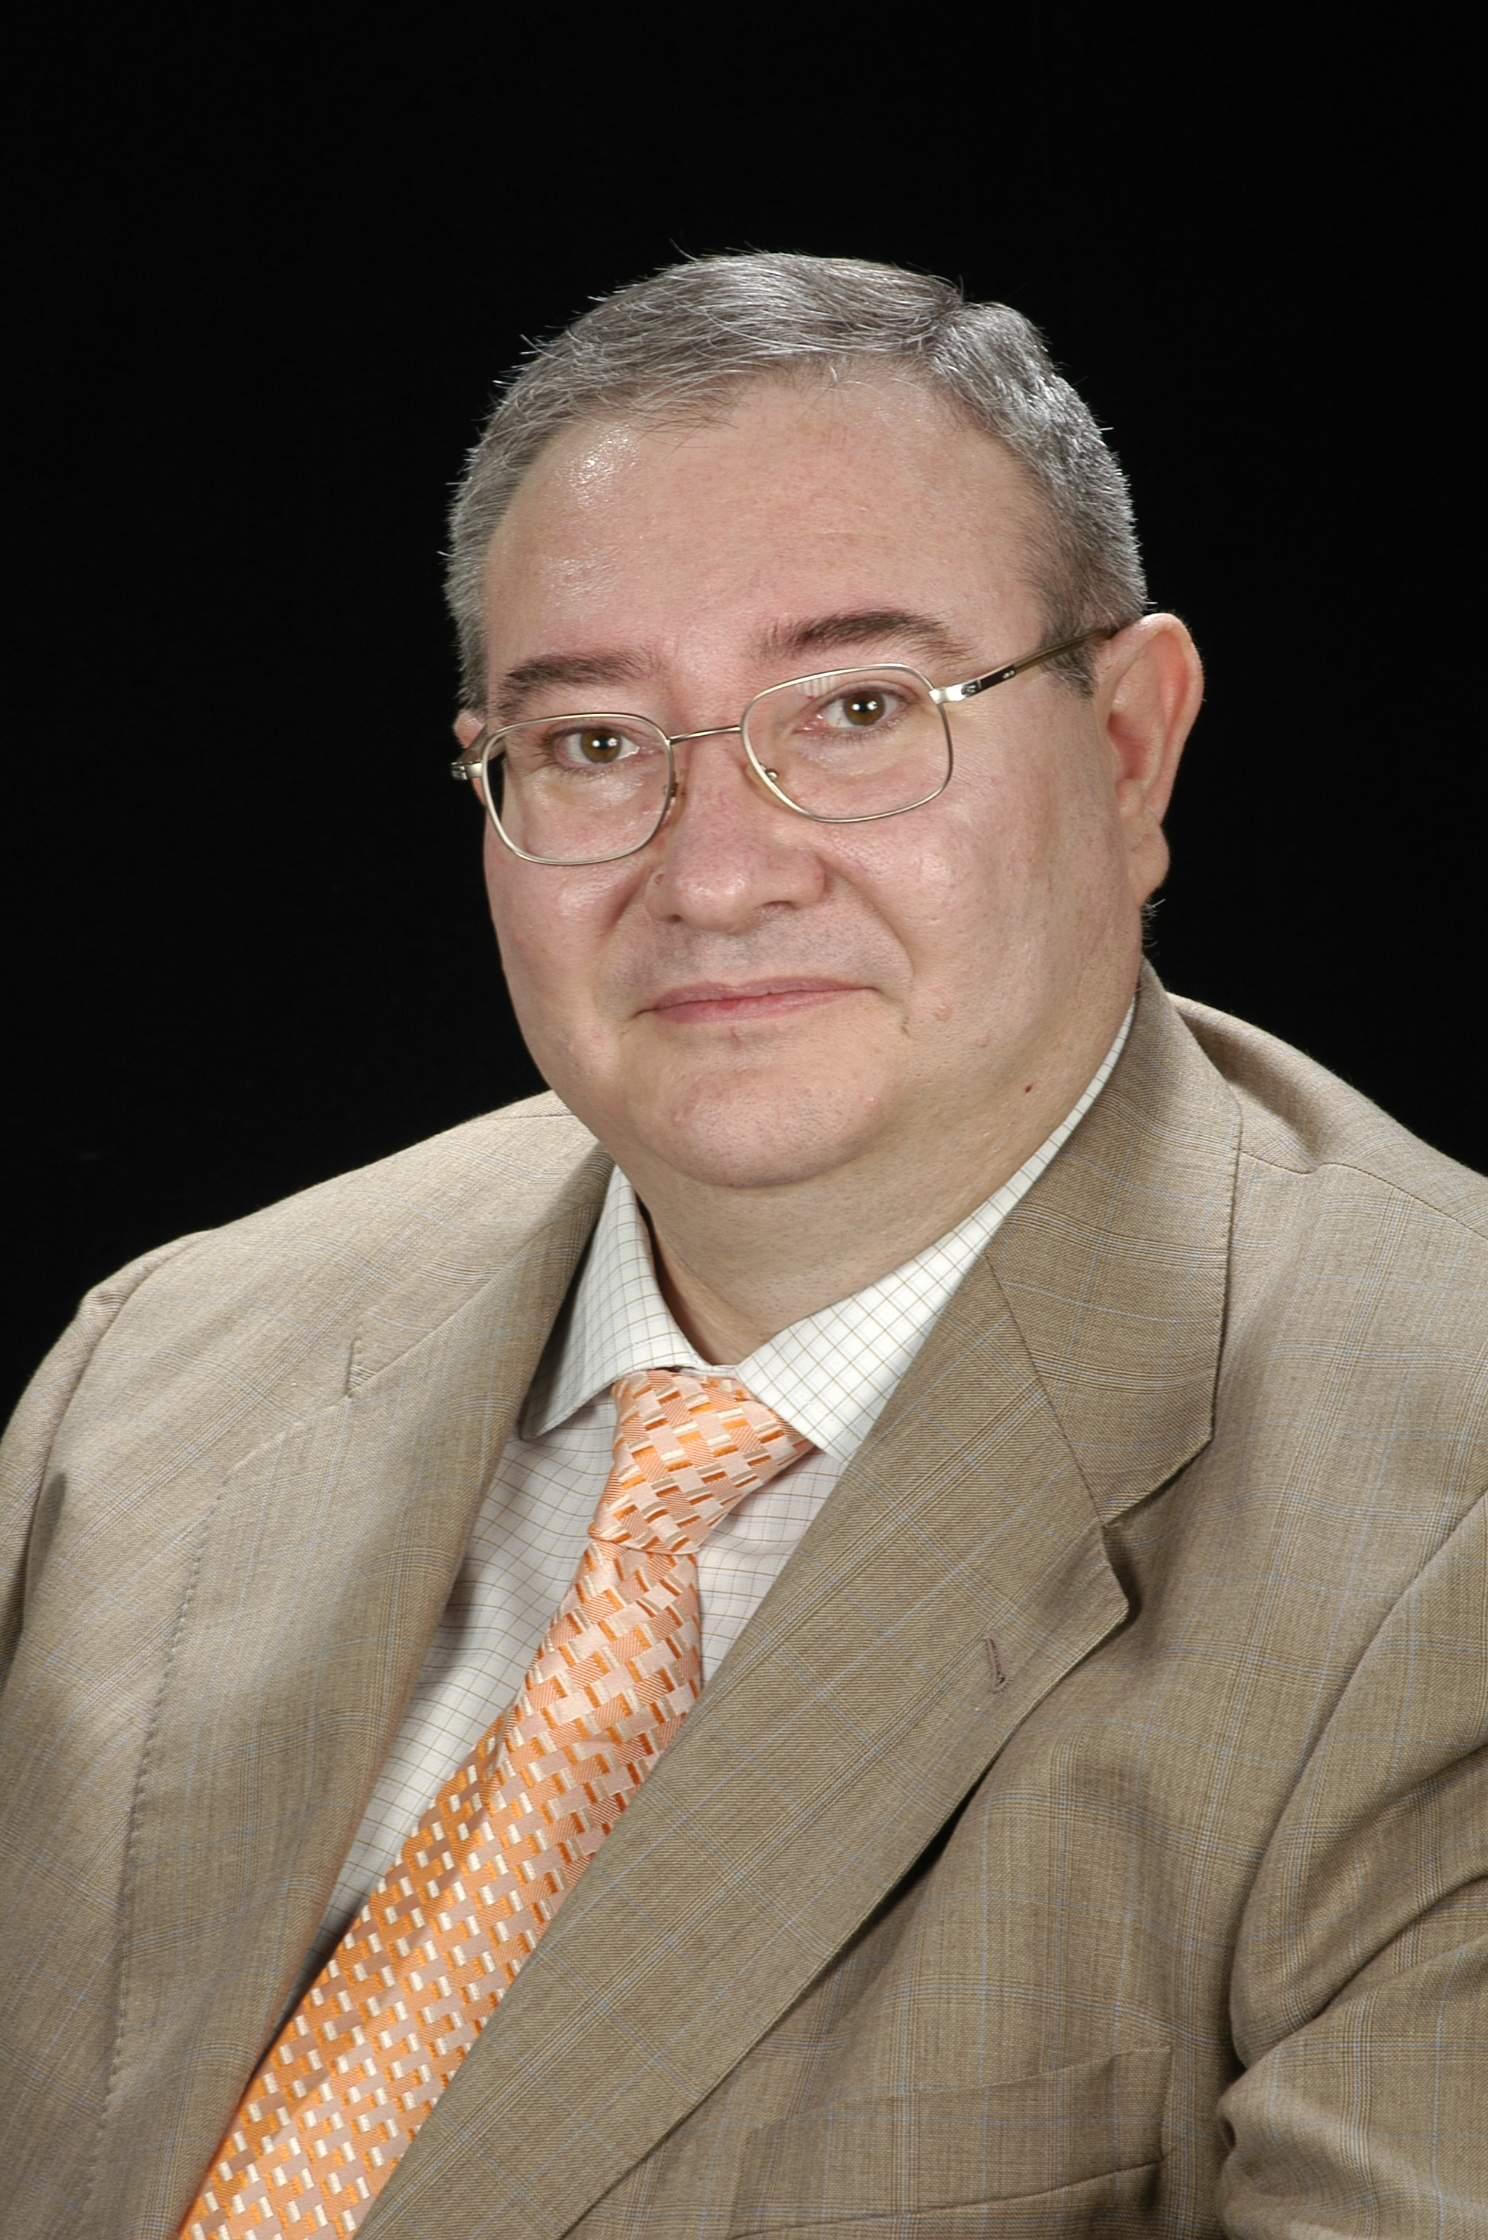 Dr. Ferran J. García